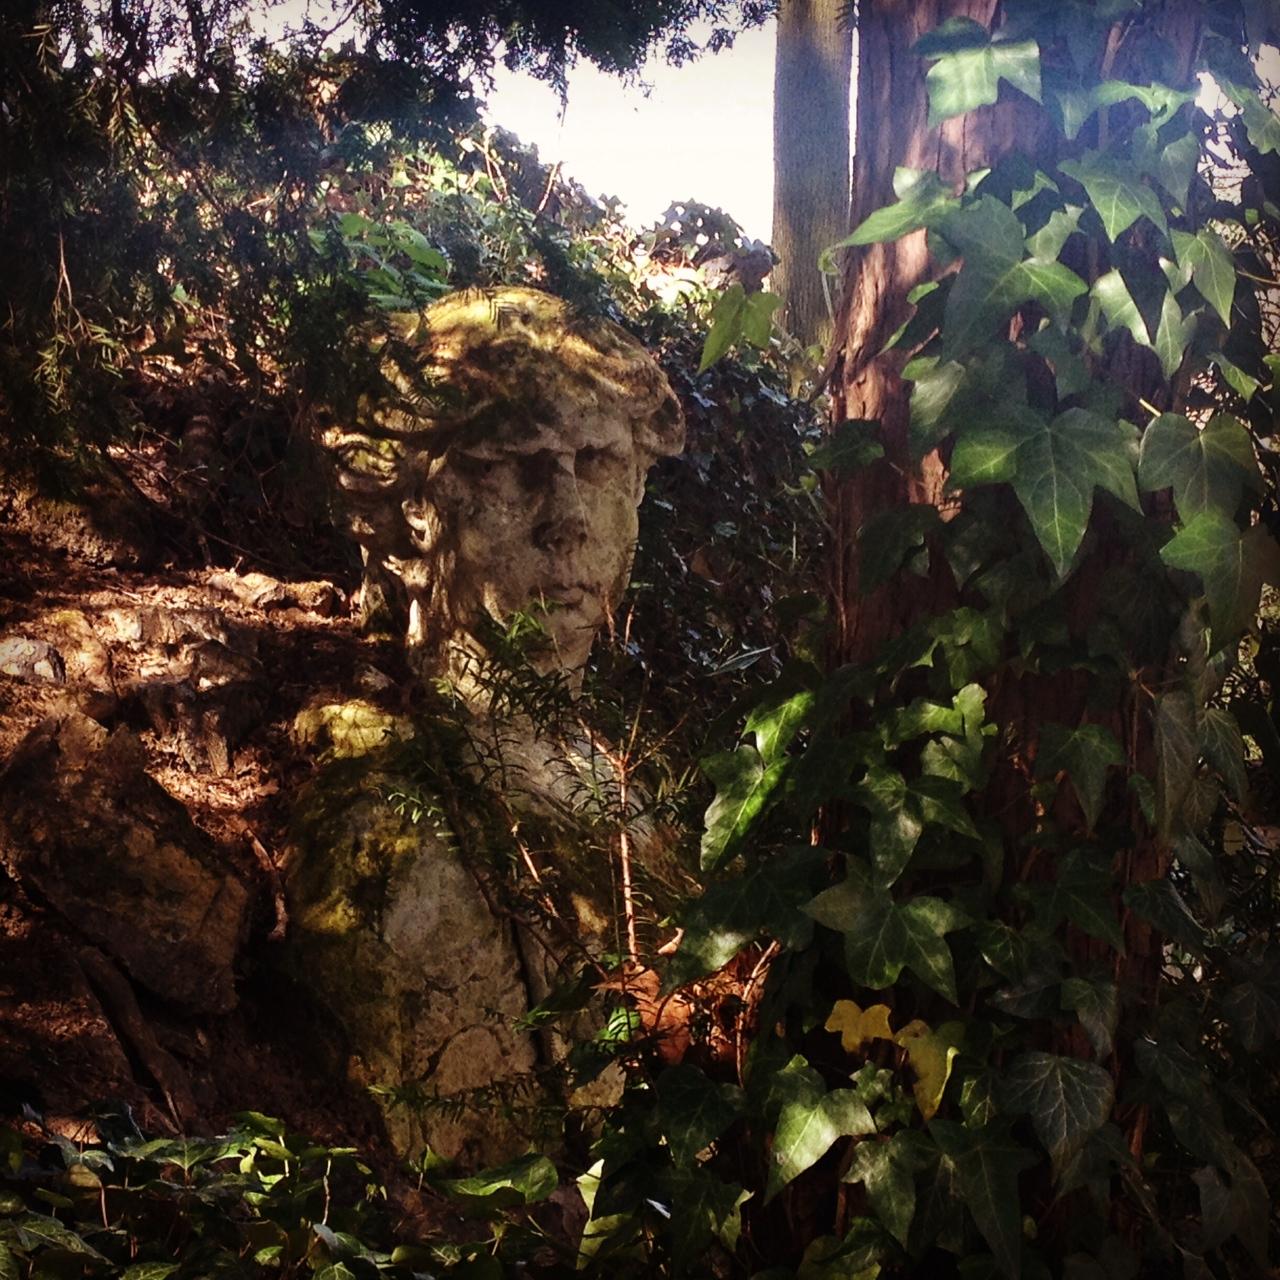 Busto nel boschetto inglese @oltreilbalcone